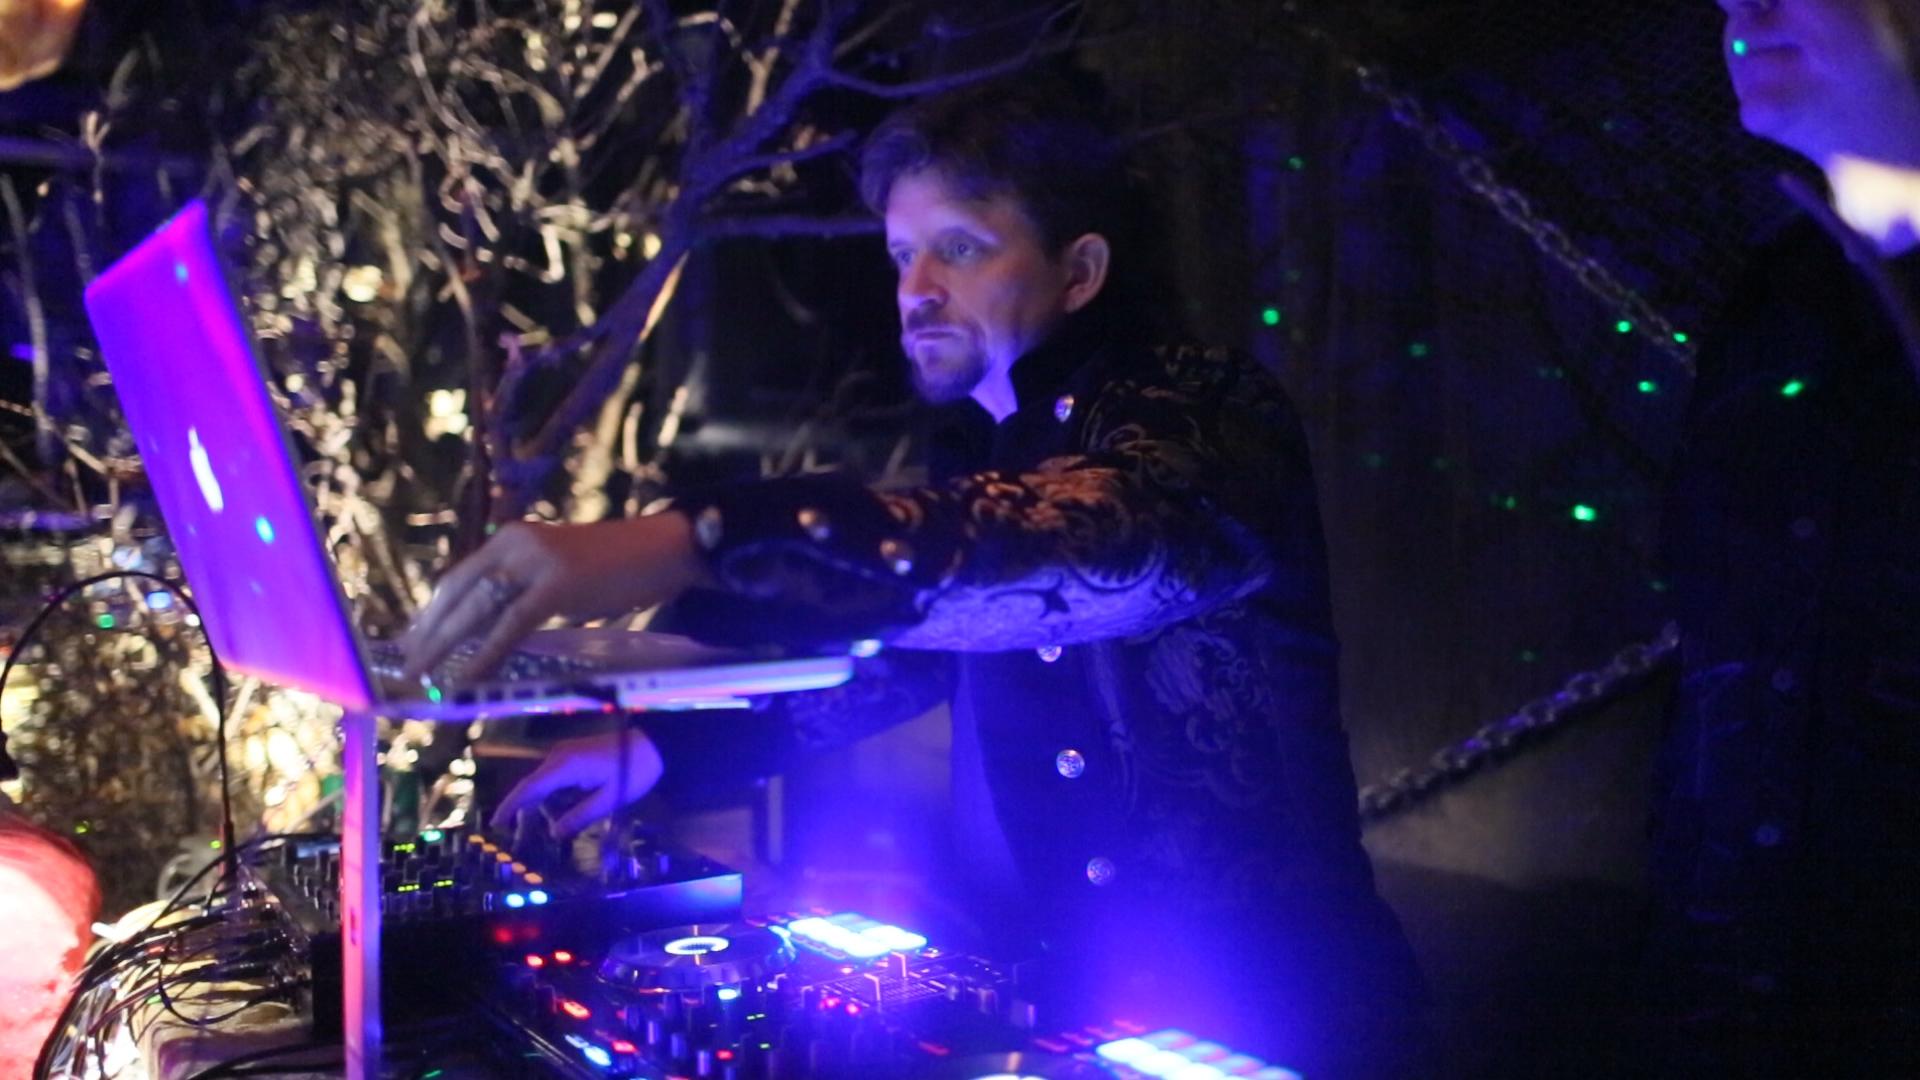 (  Bryan Franklin aka NIMITAE DJing at Supper Club, San Francisco  )